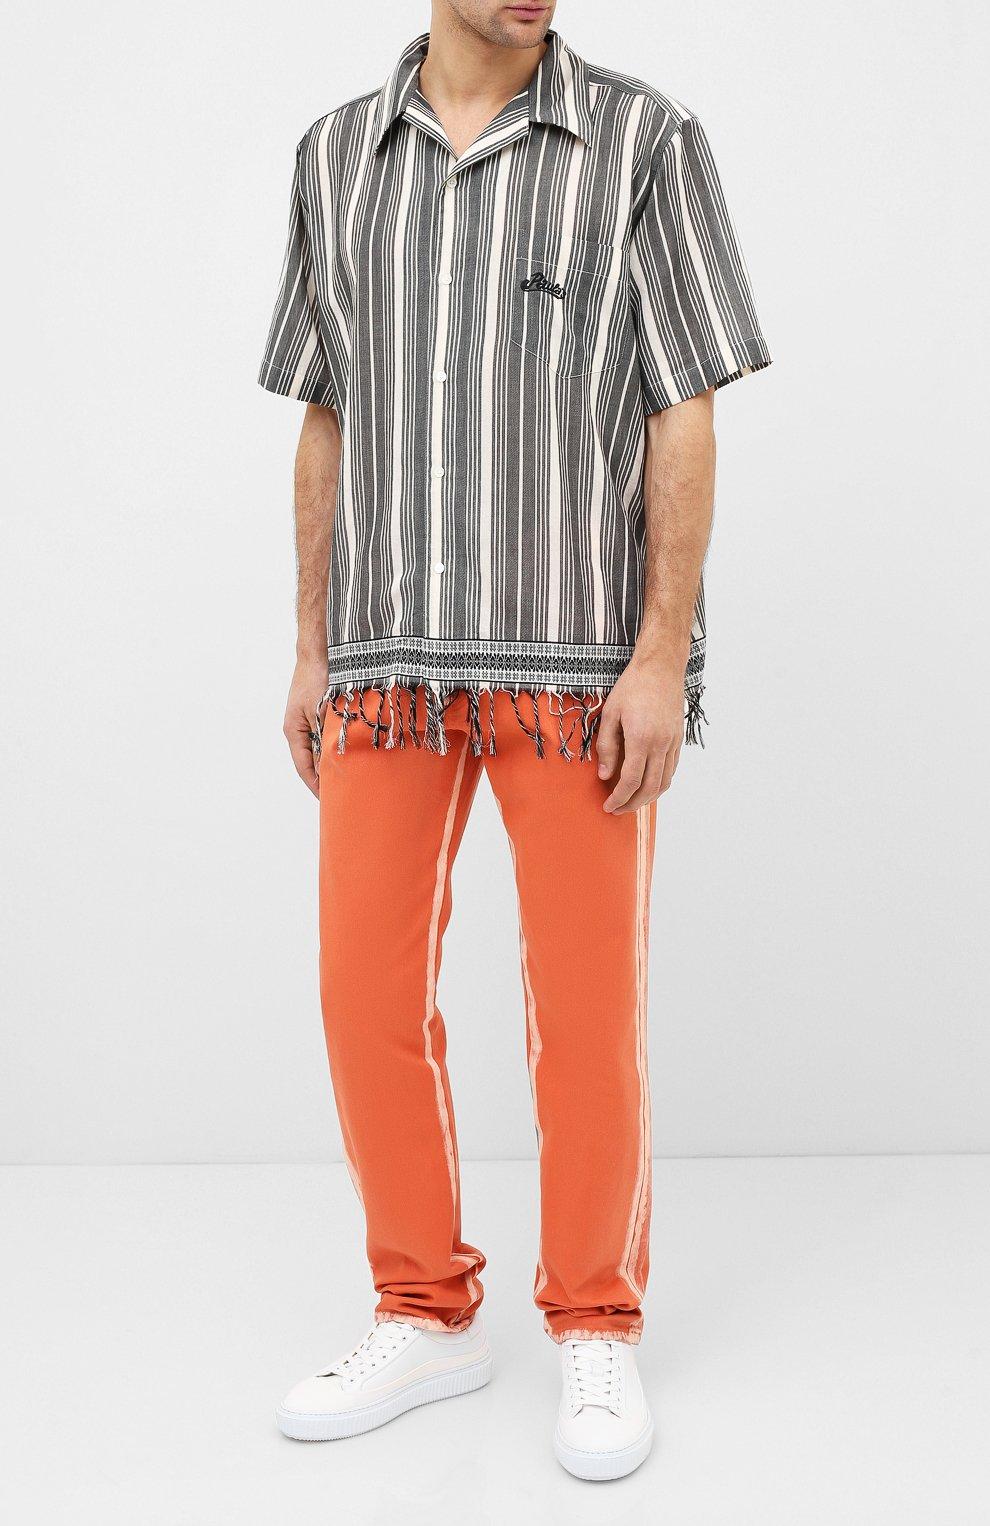 Мужская хлопковая рубашка loewe x paula's ibiza LOEWE черно-белого цвета, арт. H616337X30   Фото 2